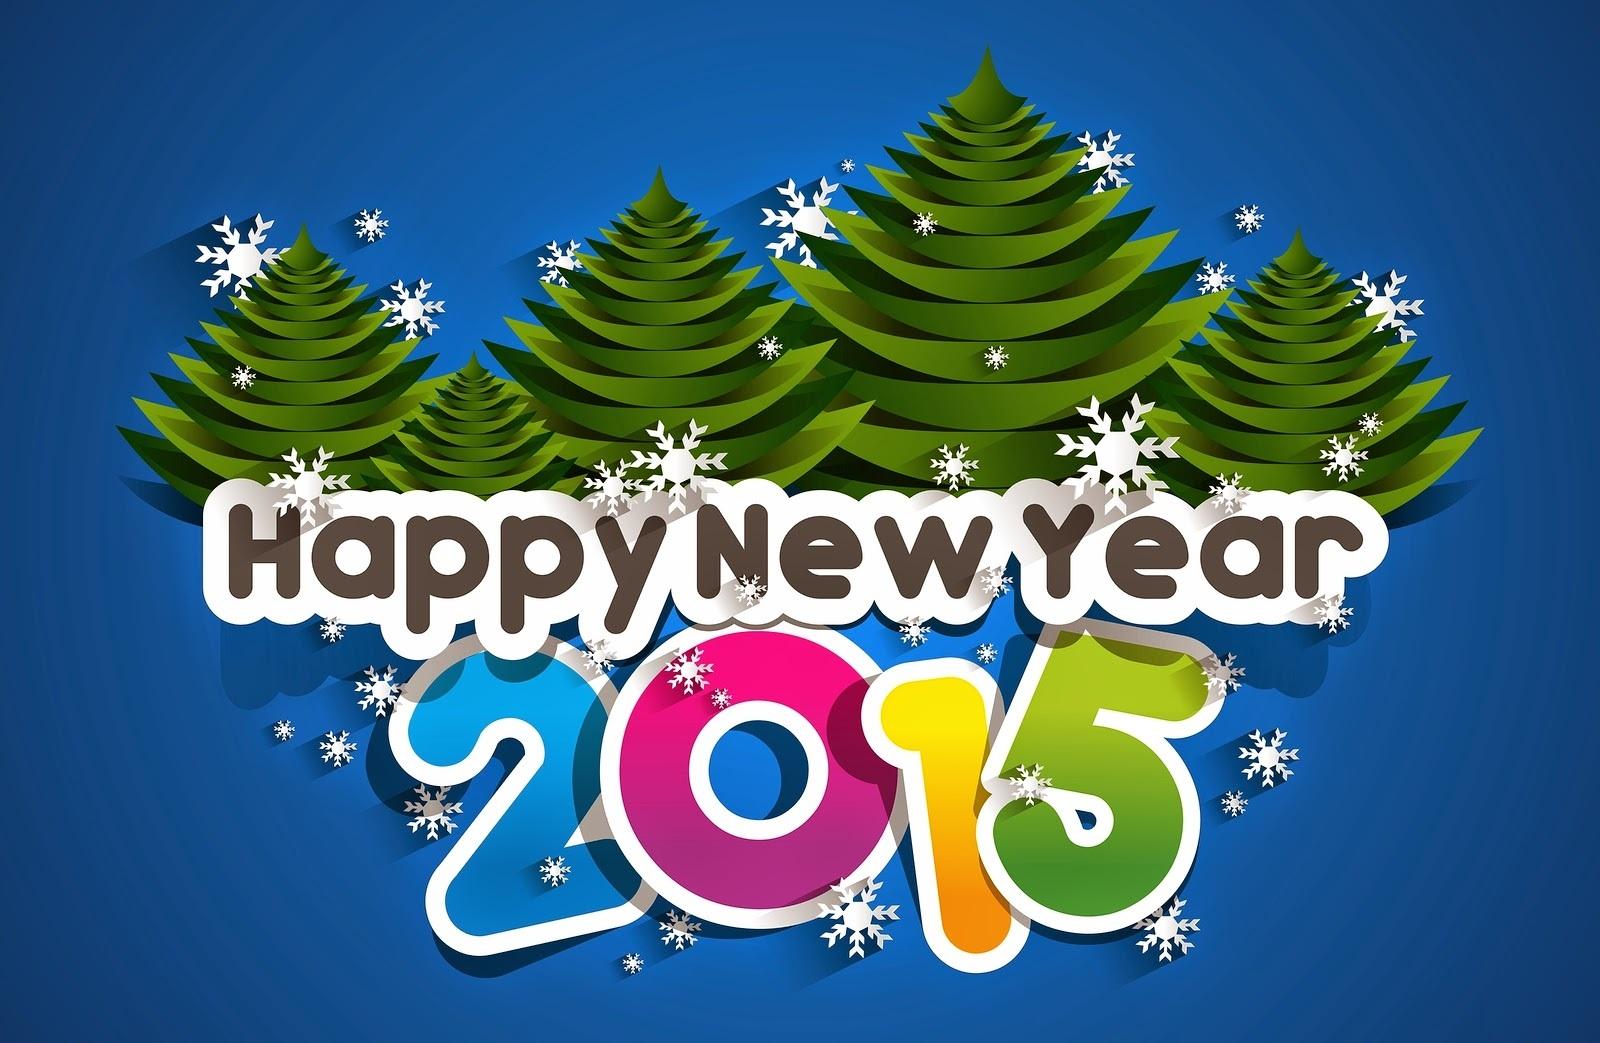 Advance Happy New Year 2015 Poetry SMS in Urdu Pics Wallpaper 1600x1043